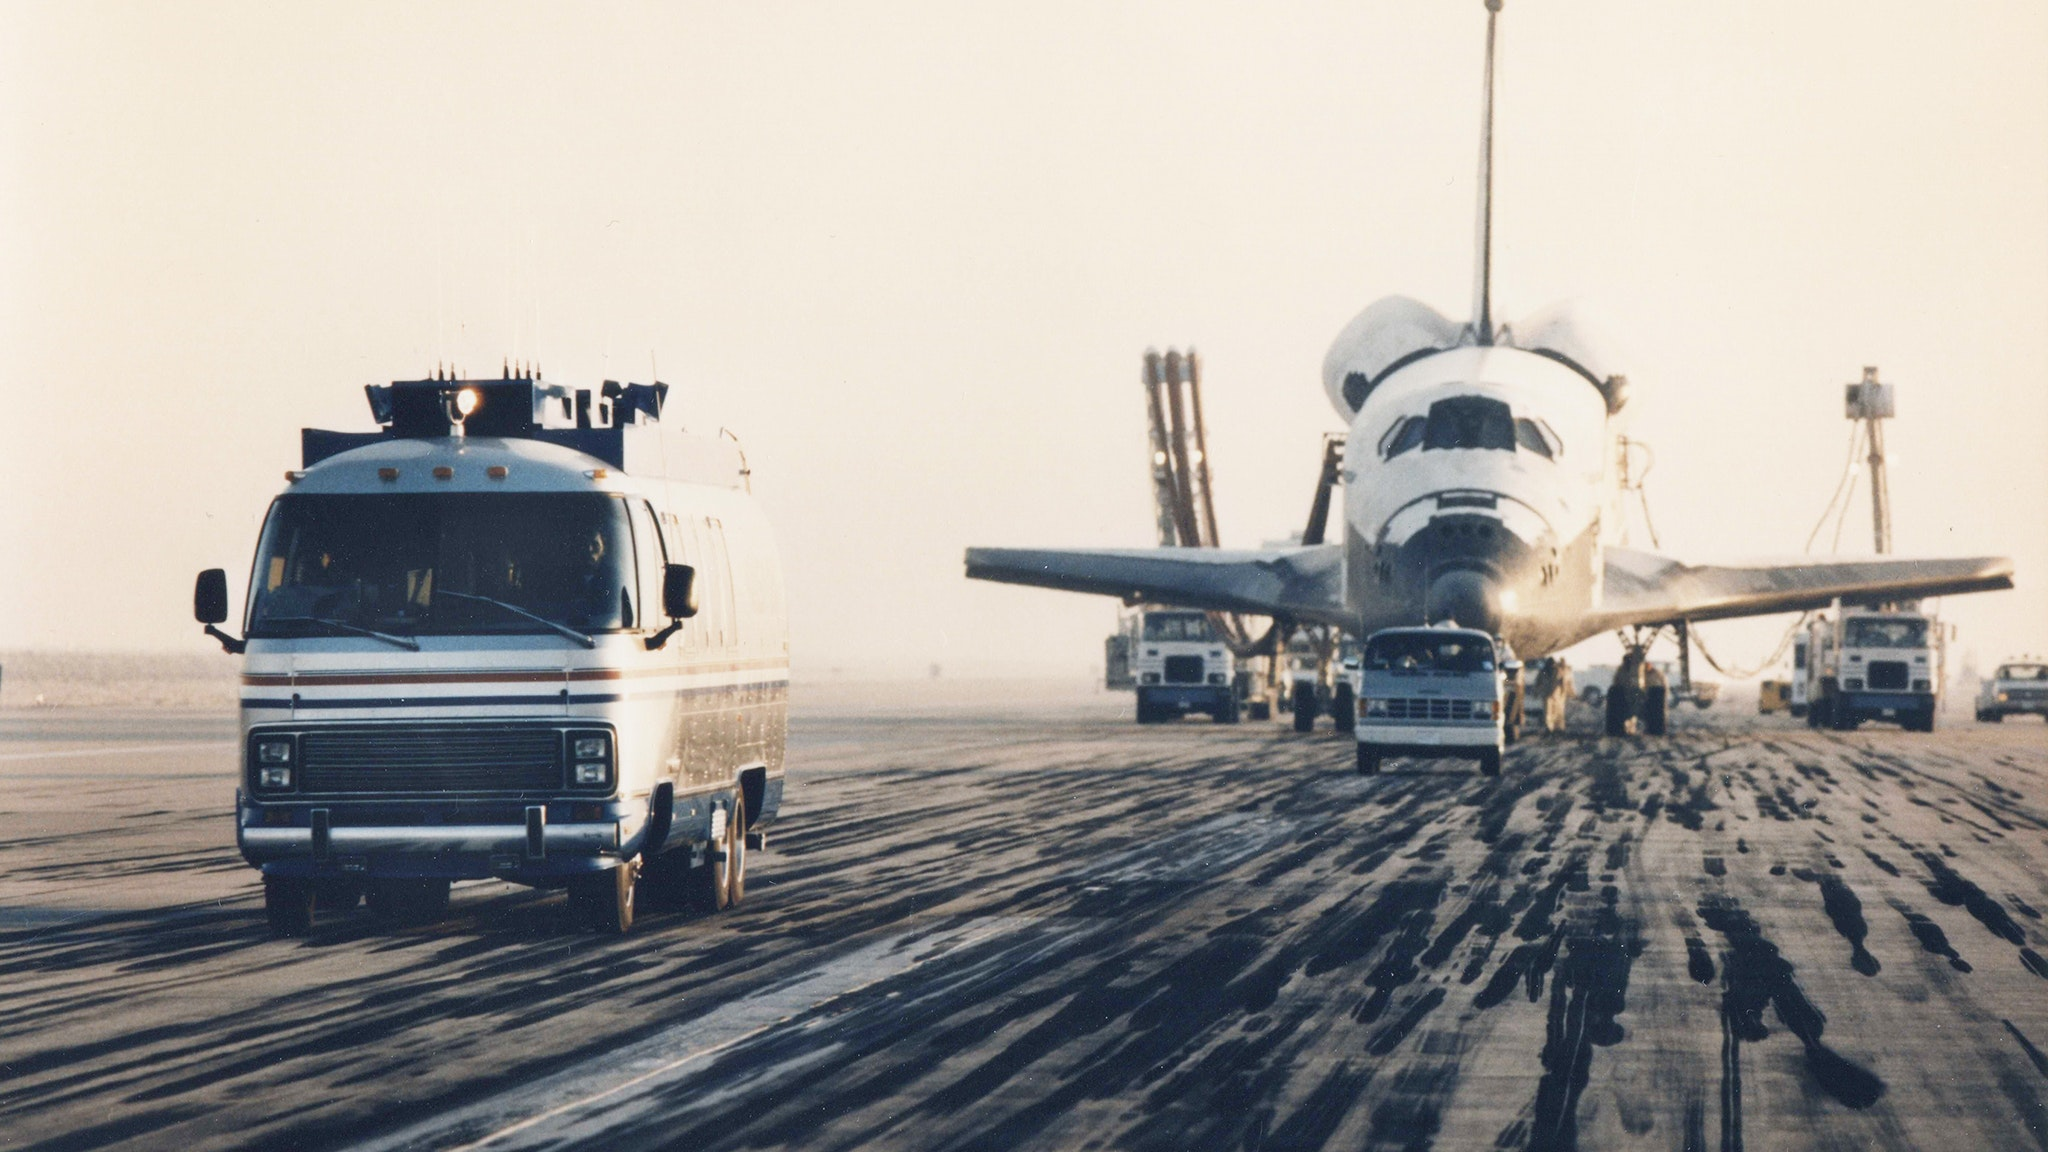 Airstream Astrovan NASA Space Shuttle